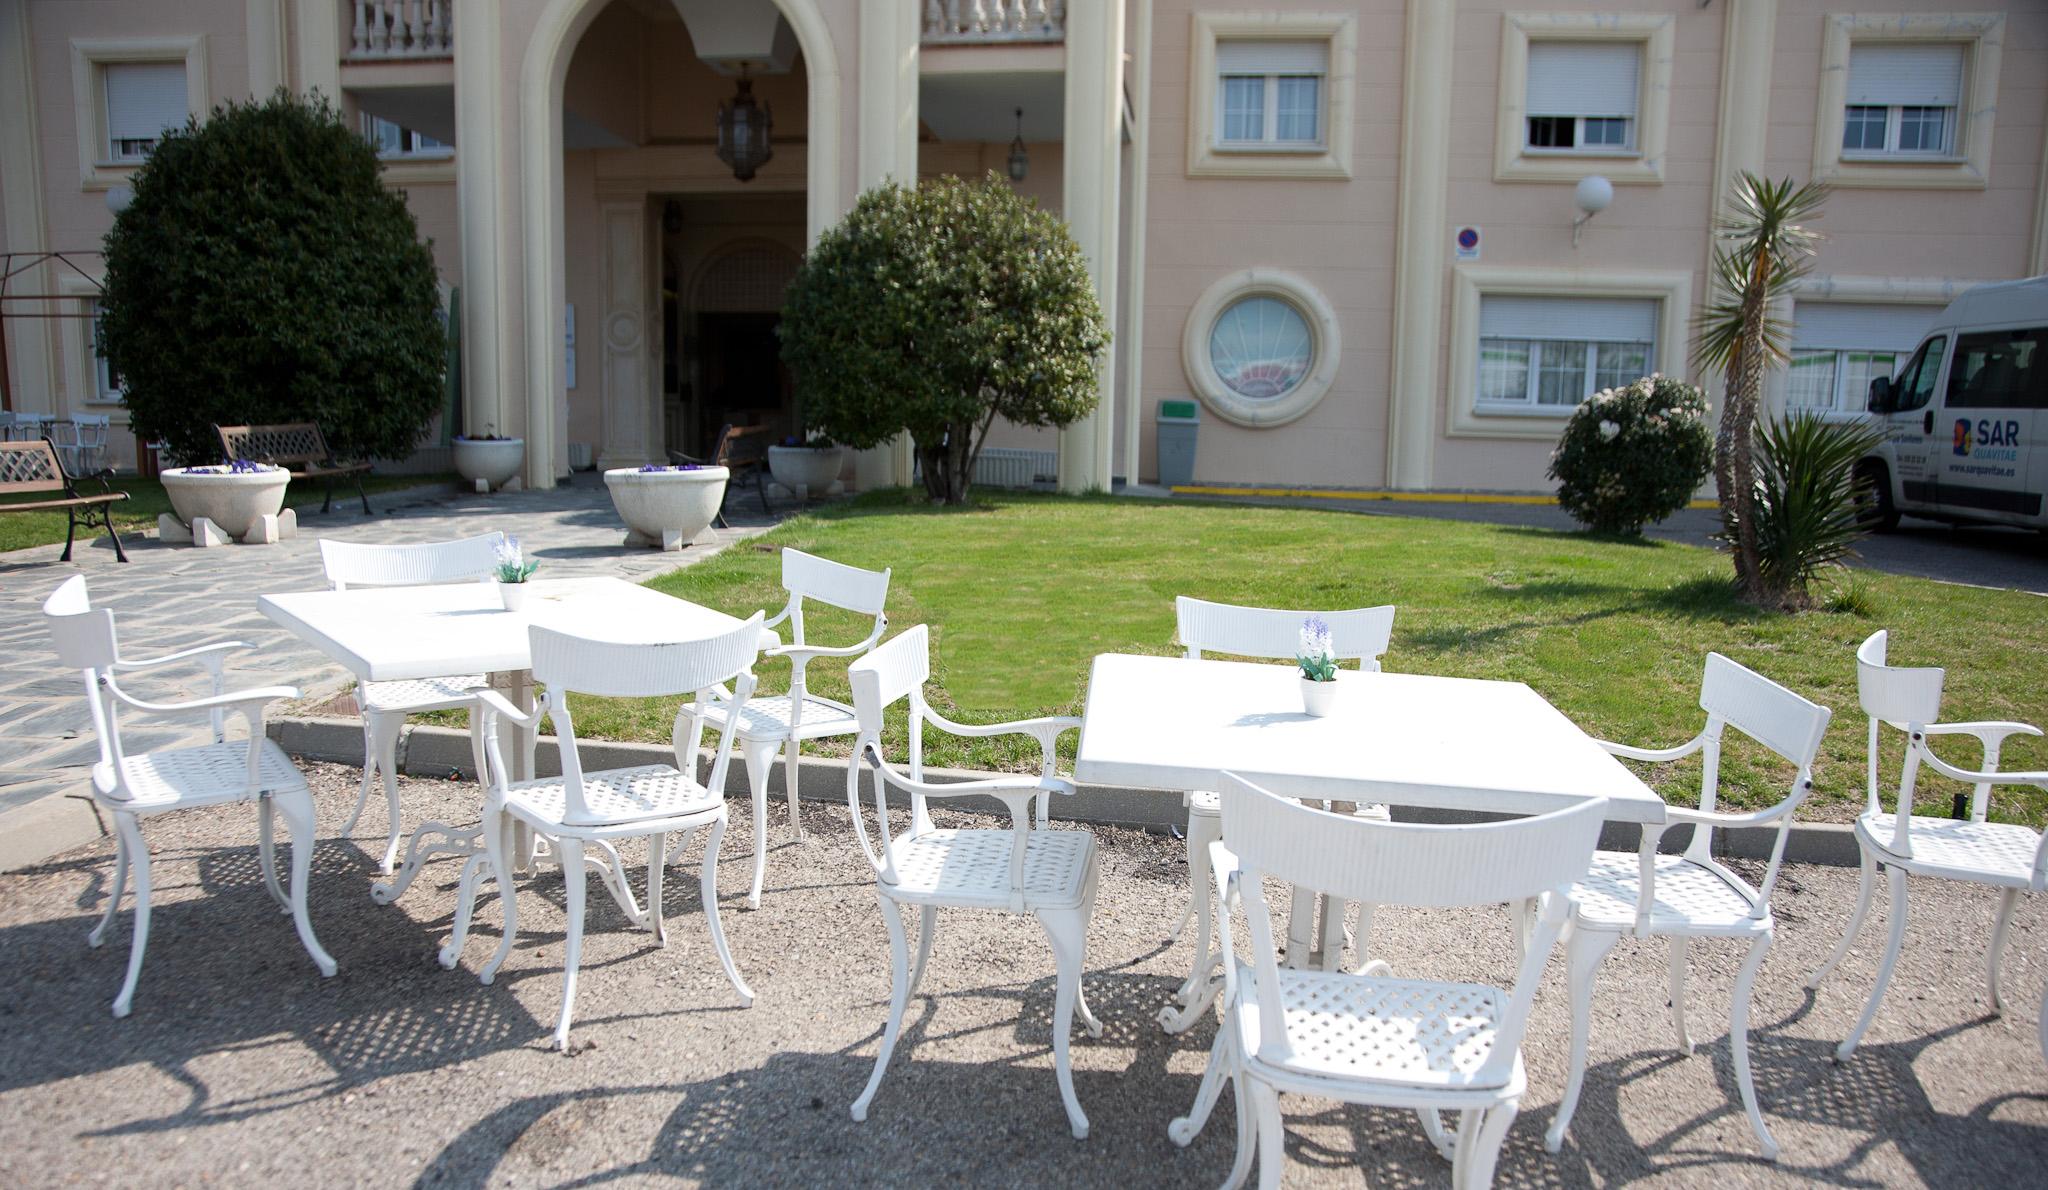 Terraza residencia de ancianos SARquavitae Parque Gavilanes Toledo